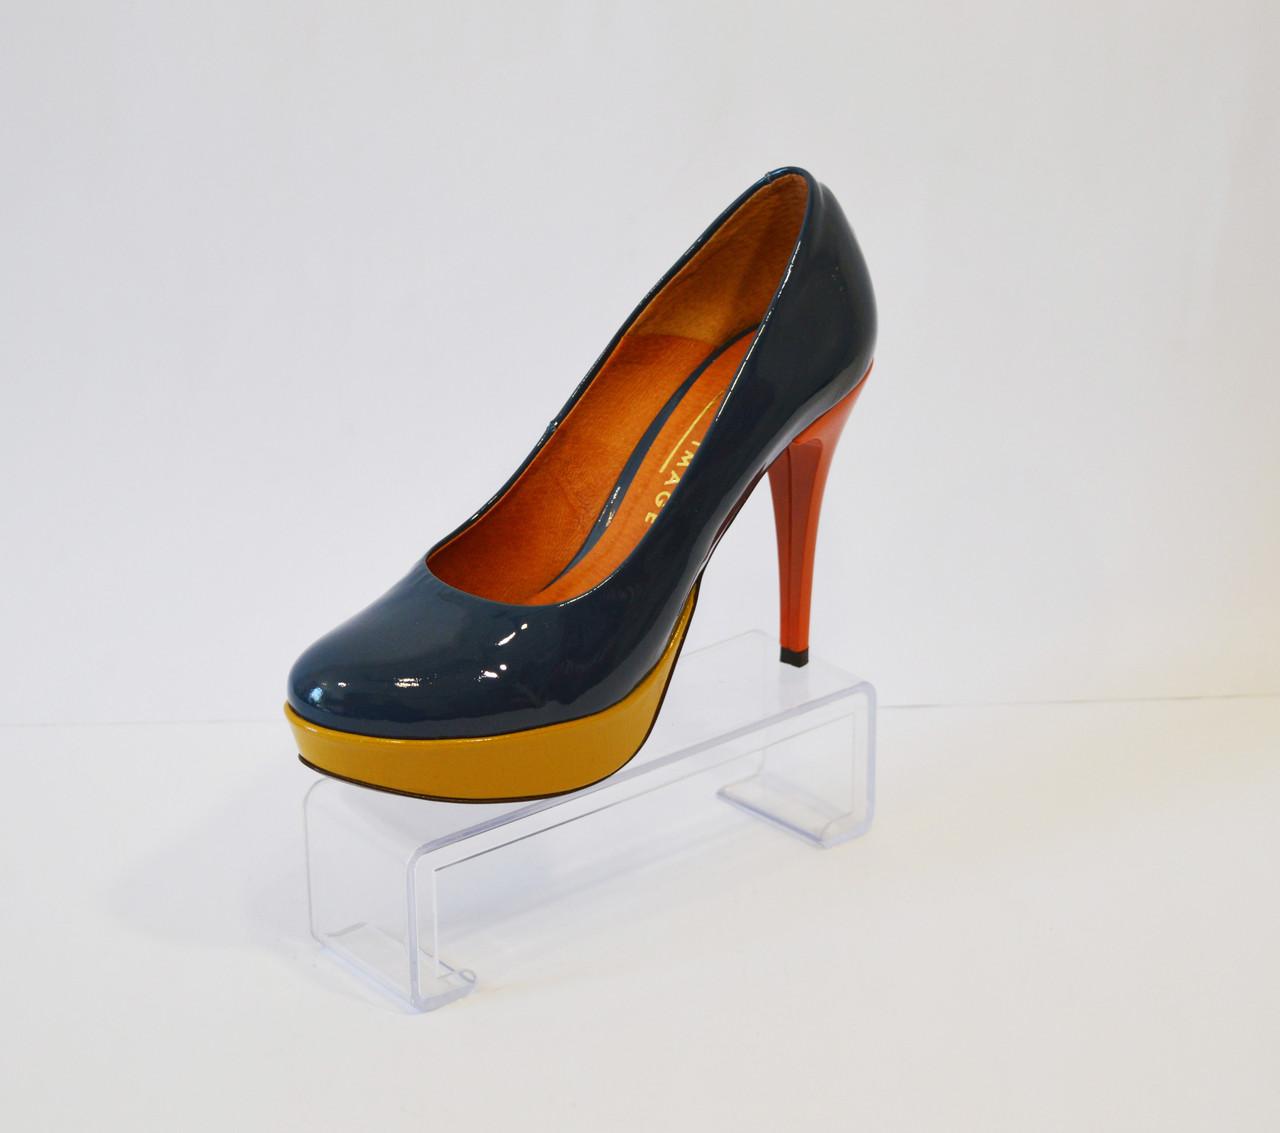 Туфли женские But S 440 38 размер